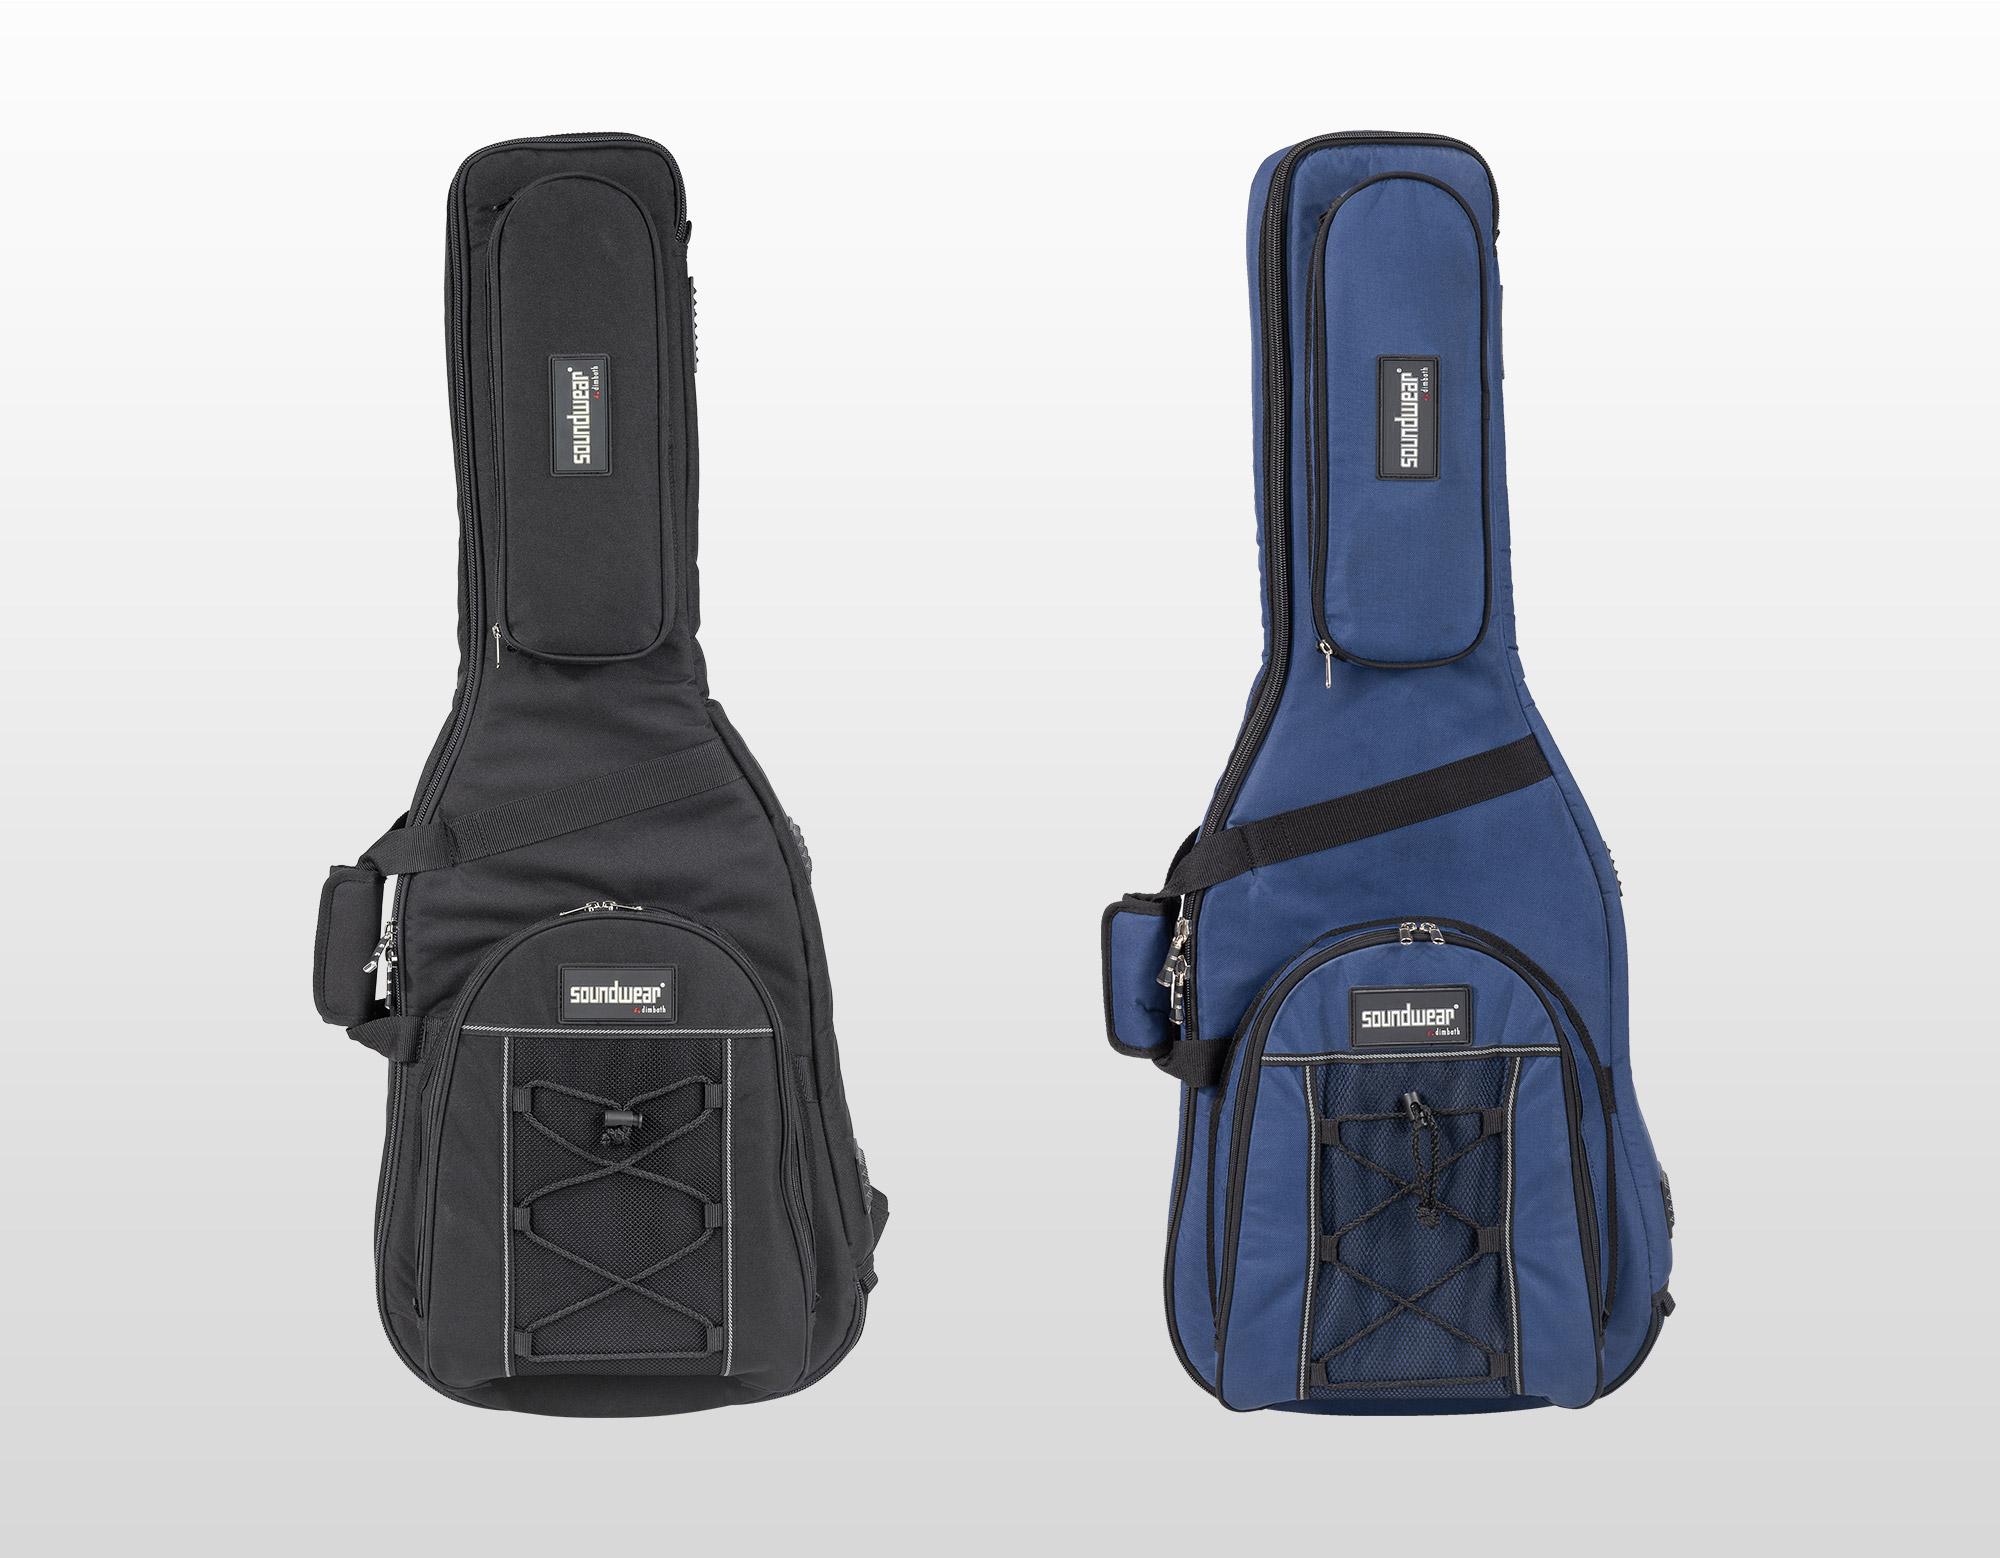 SOUNDWEAR BARITON SAX BAG TASCHE  Professional BSAH  Bag for Baritone Saxophone